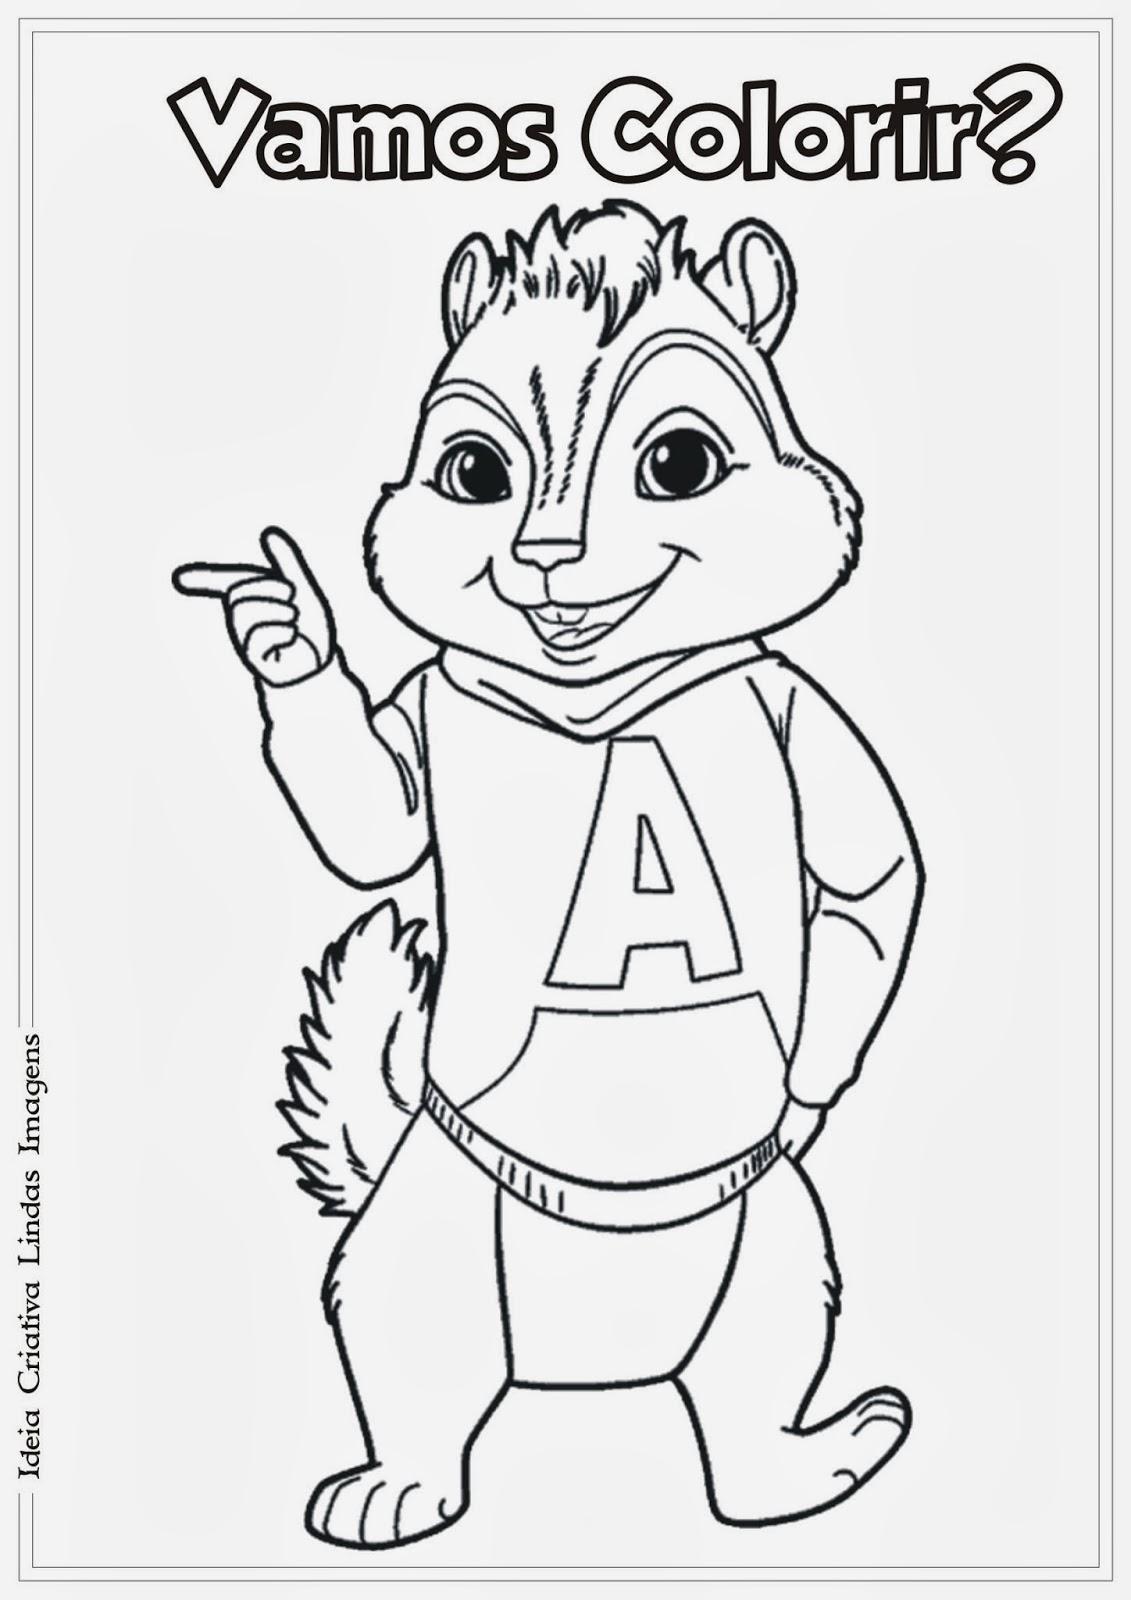 Como Desenhar Alvin E Os Esquilos